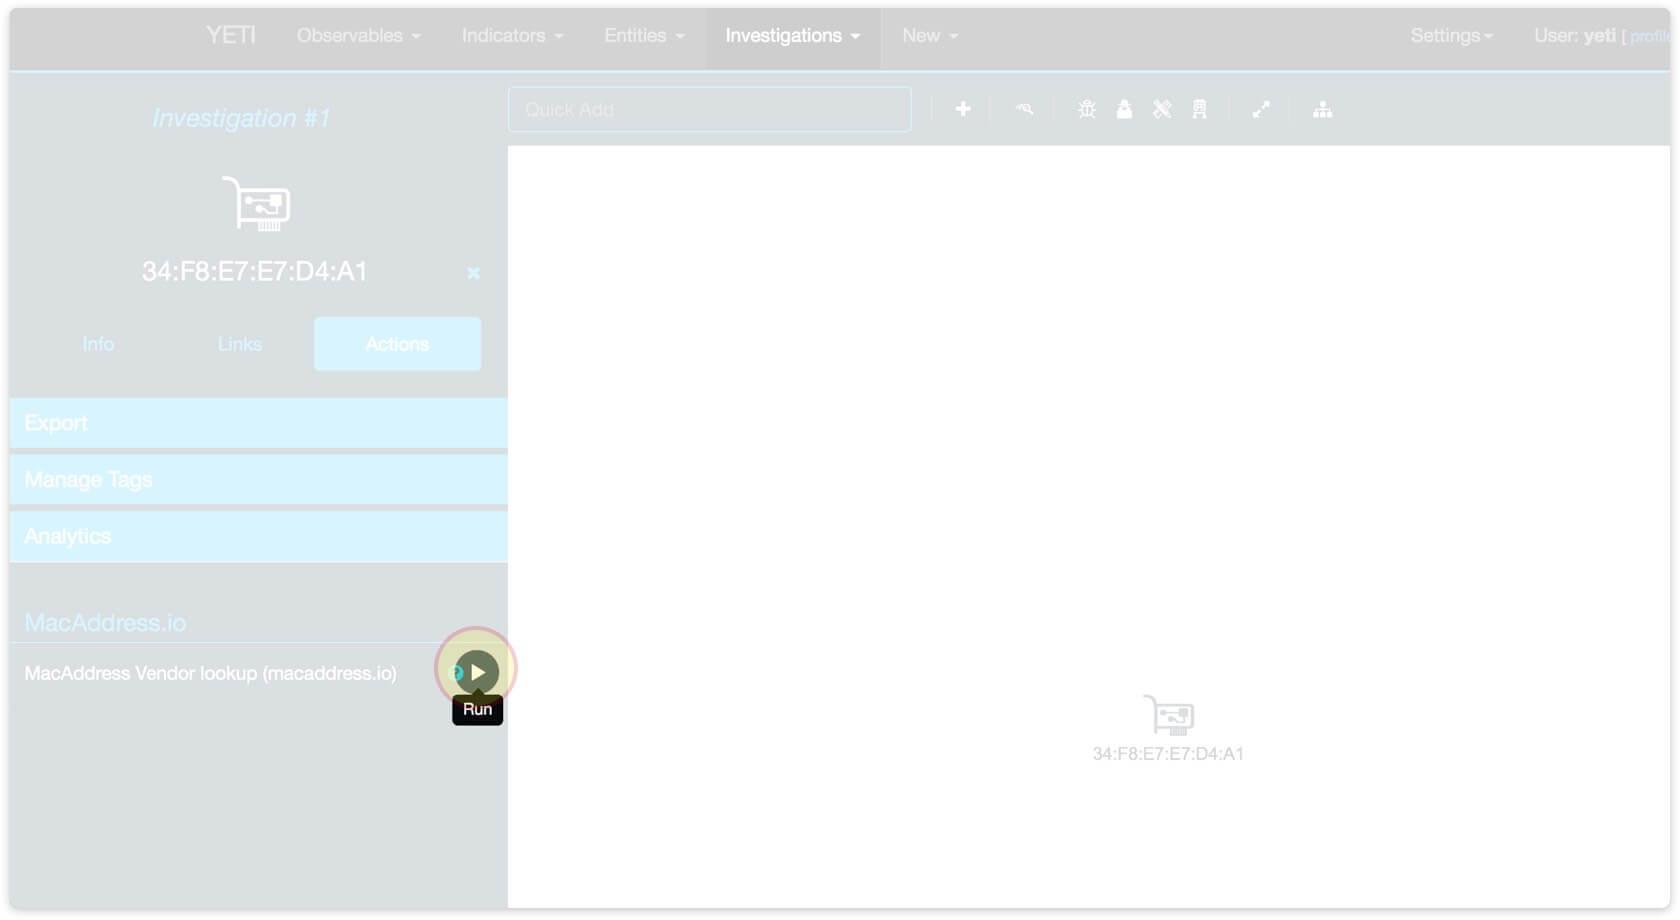 Click 'Run' to start the Mac Address Vendor Lookup analytics